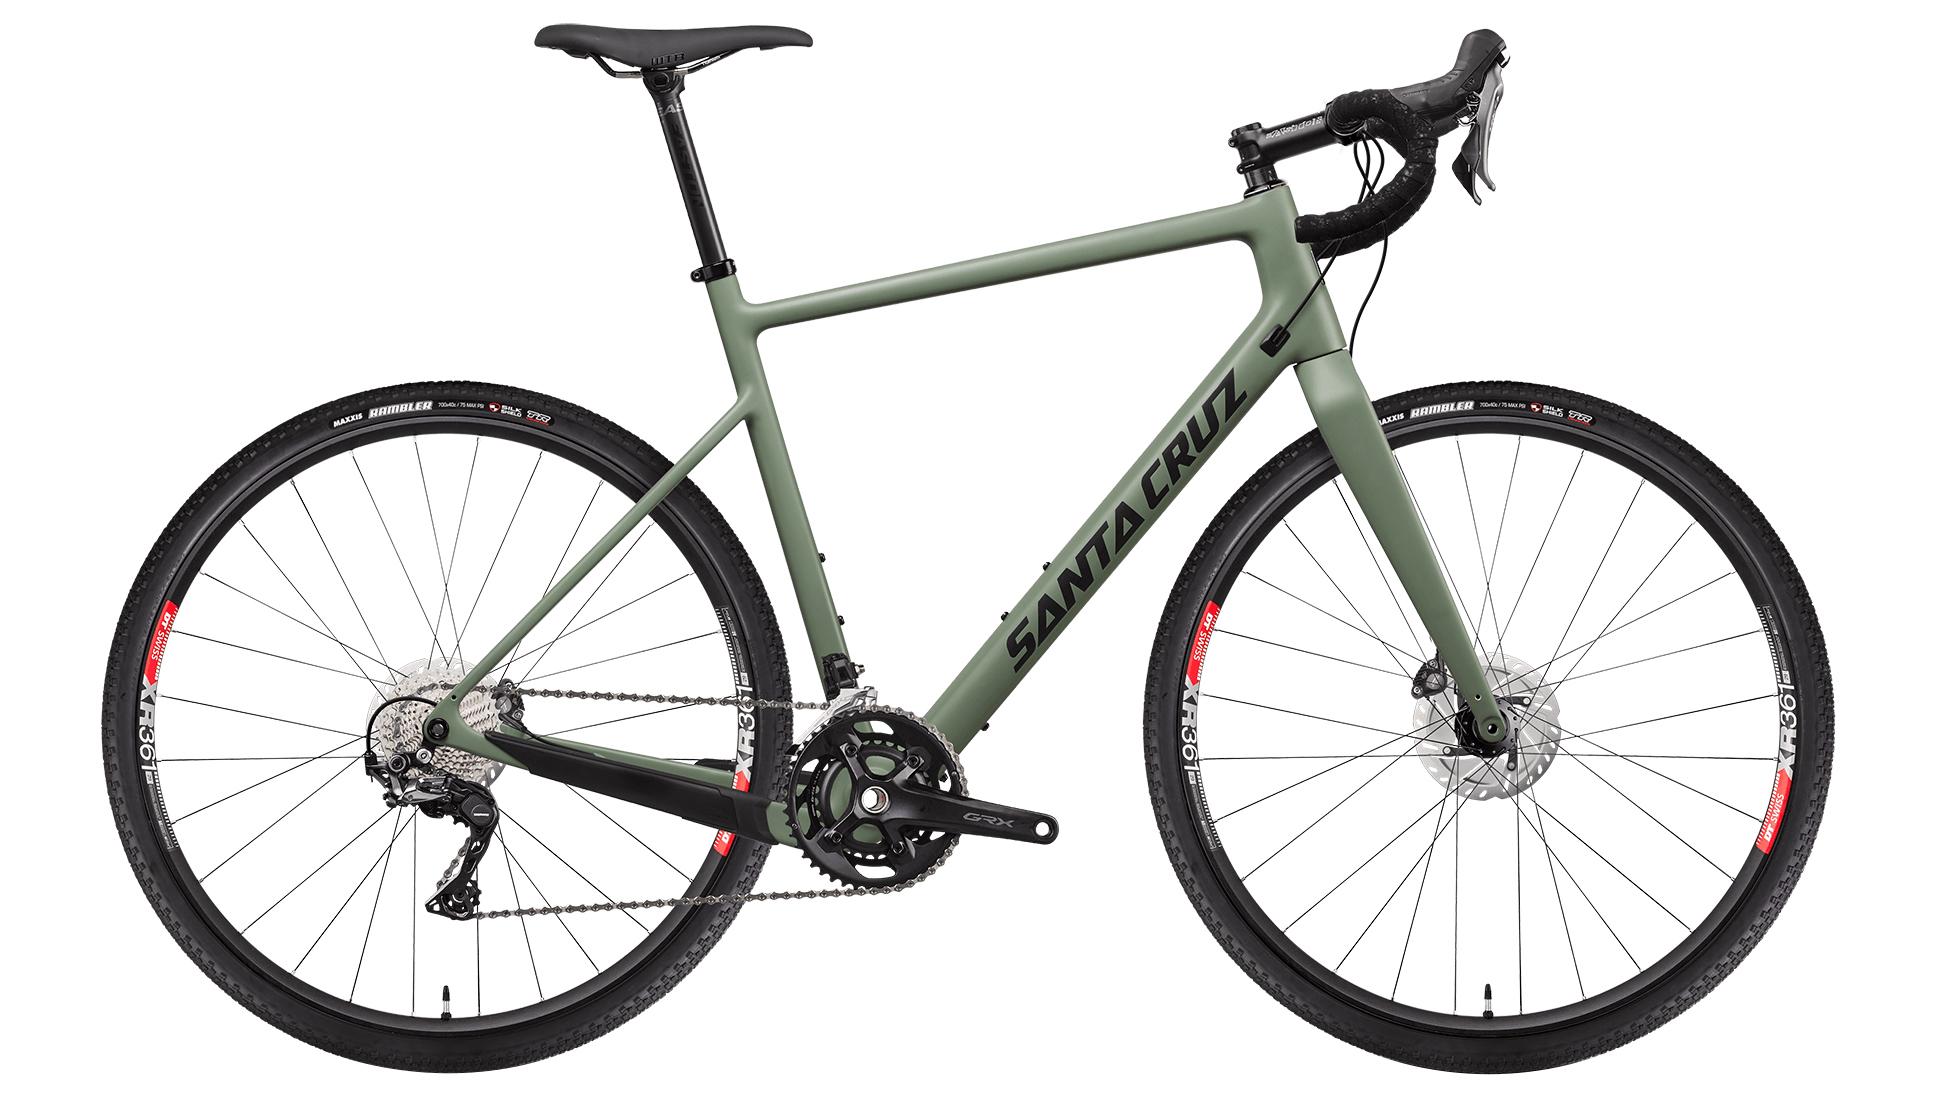 Santa Cruz Stigmata CC GRX Bike 2020 | Jenson USA